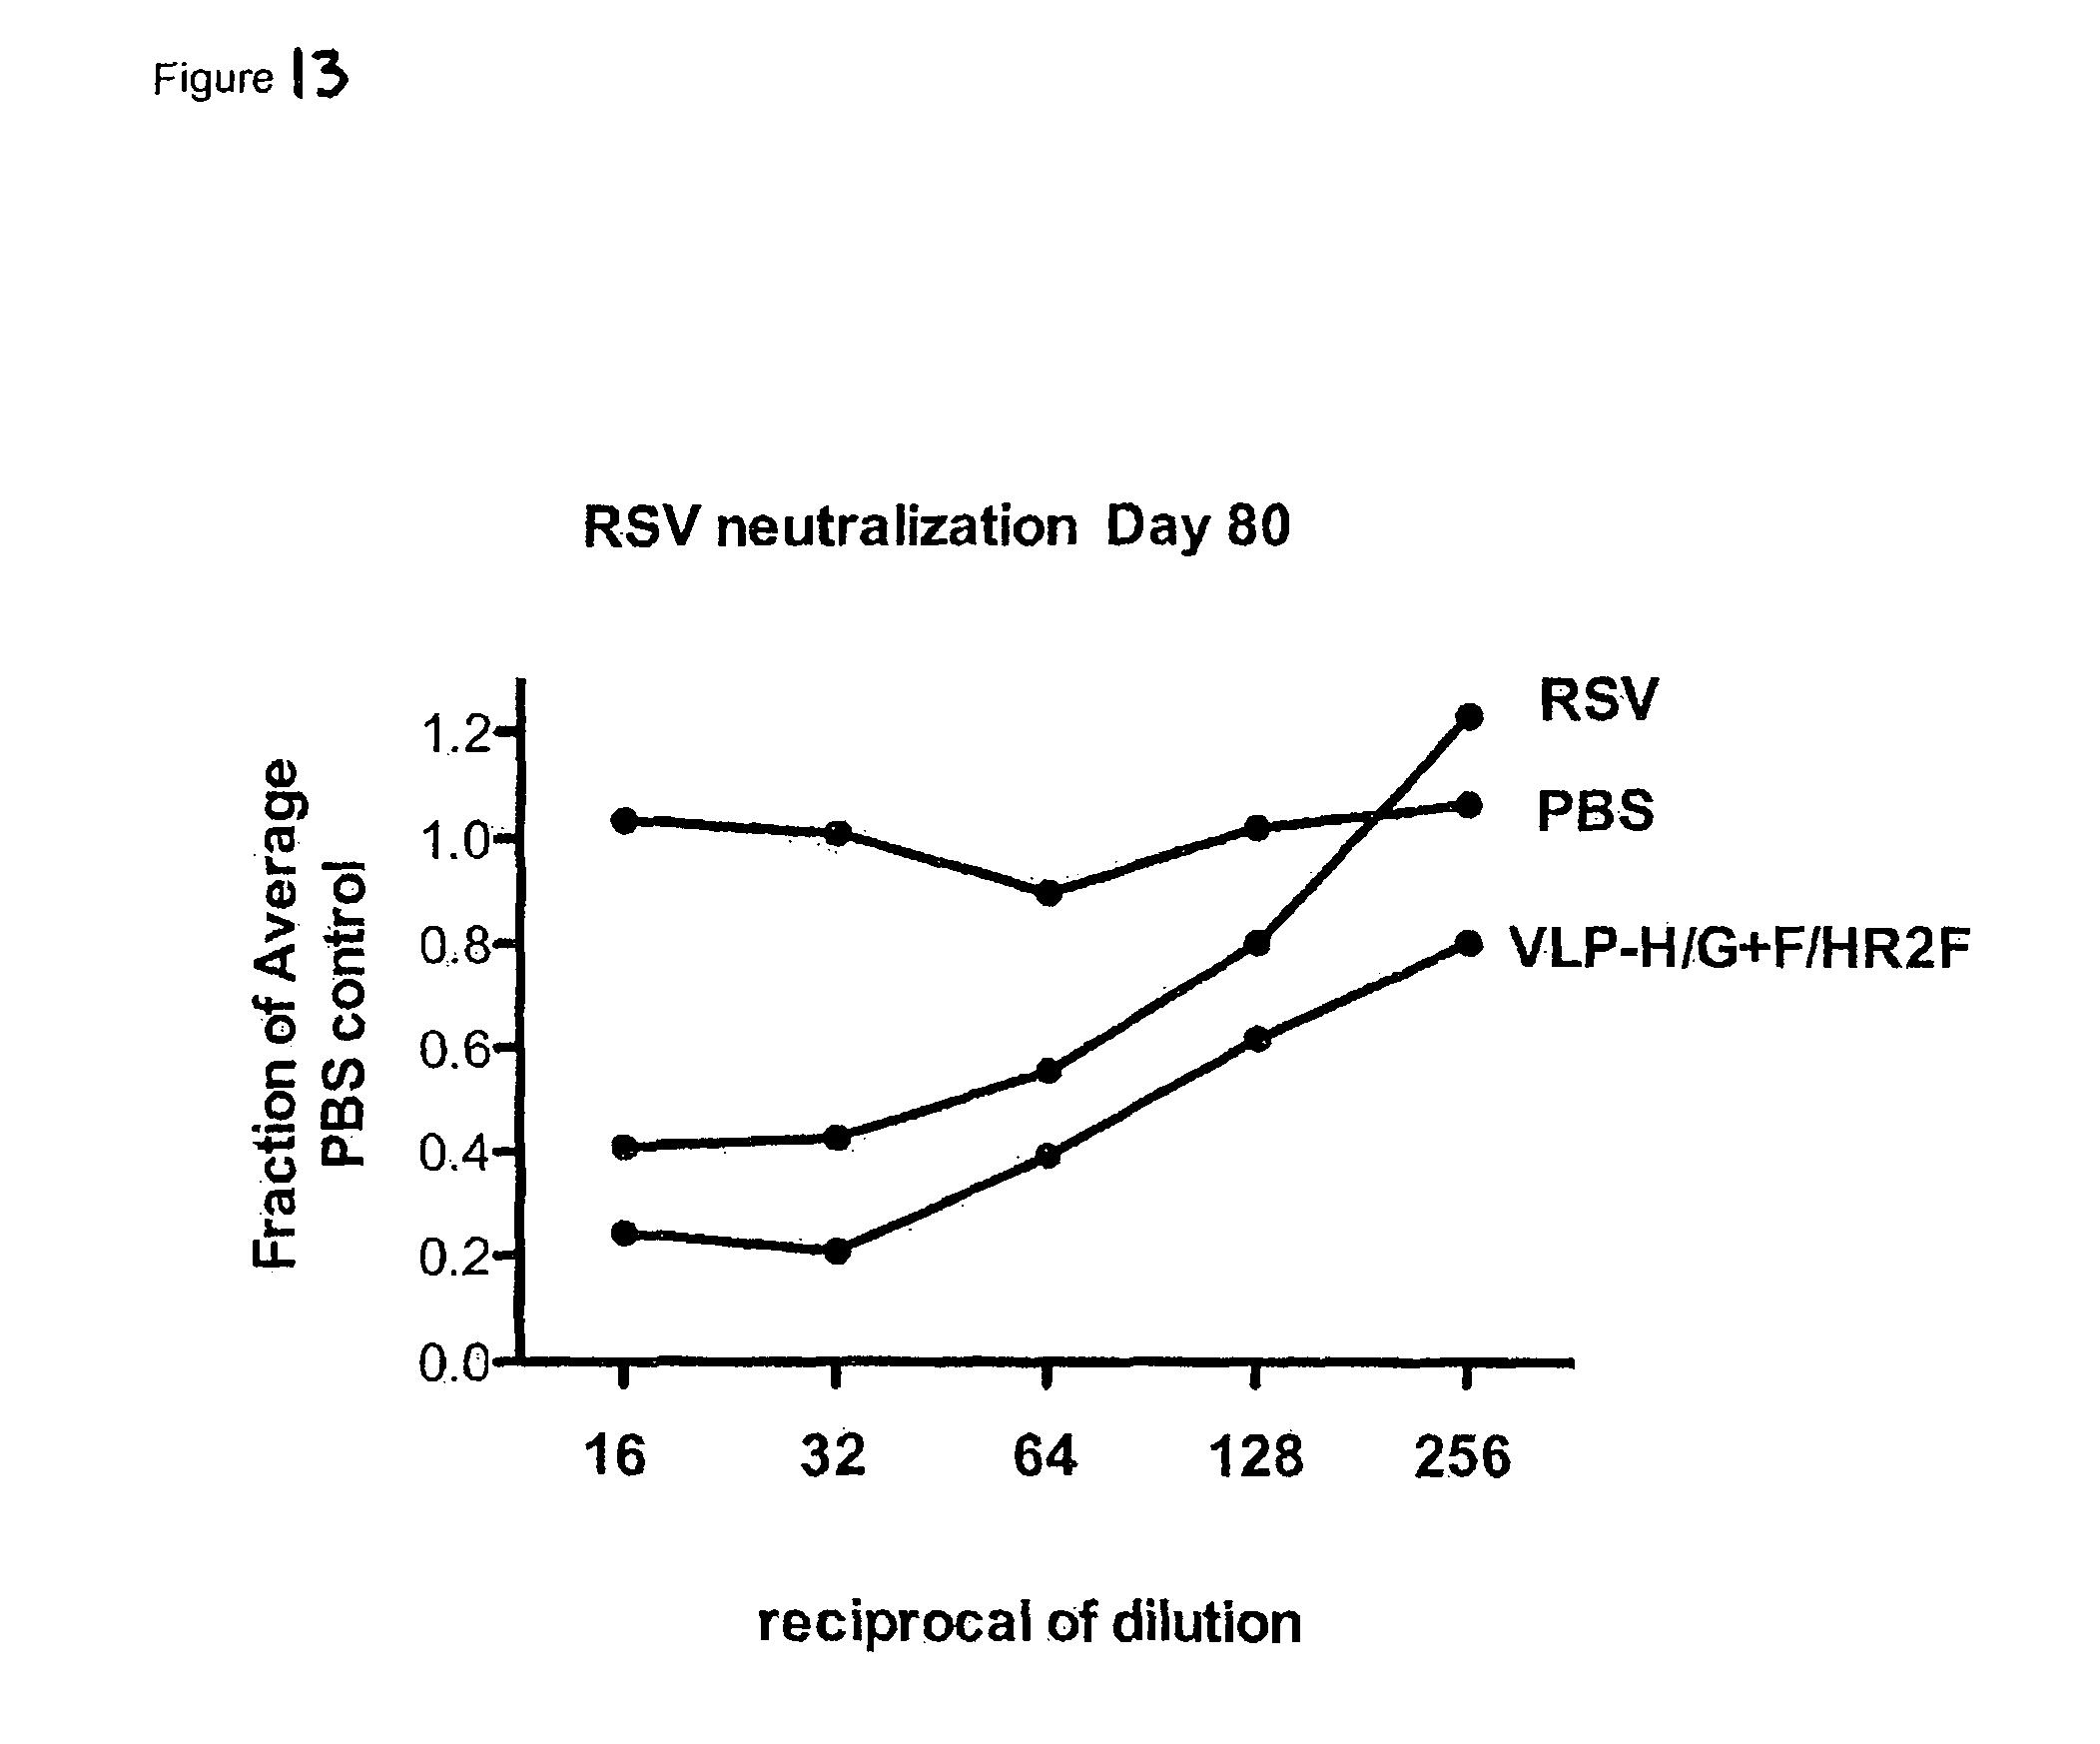 rsv vaccine formulation • vaccines for active immunization of rsv-naïve infants should induce neutralizing antibodies, cd4 and cd8 responses  formulation selection phase iii 2-3mo infants.